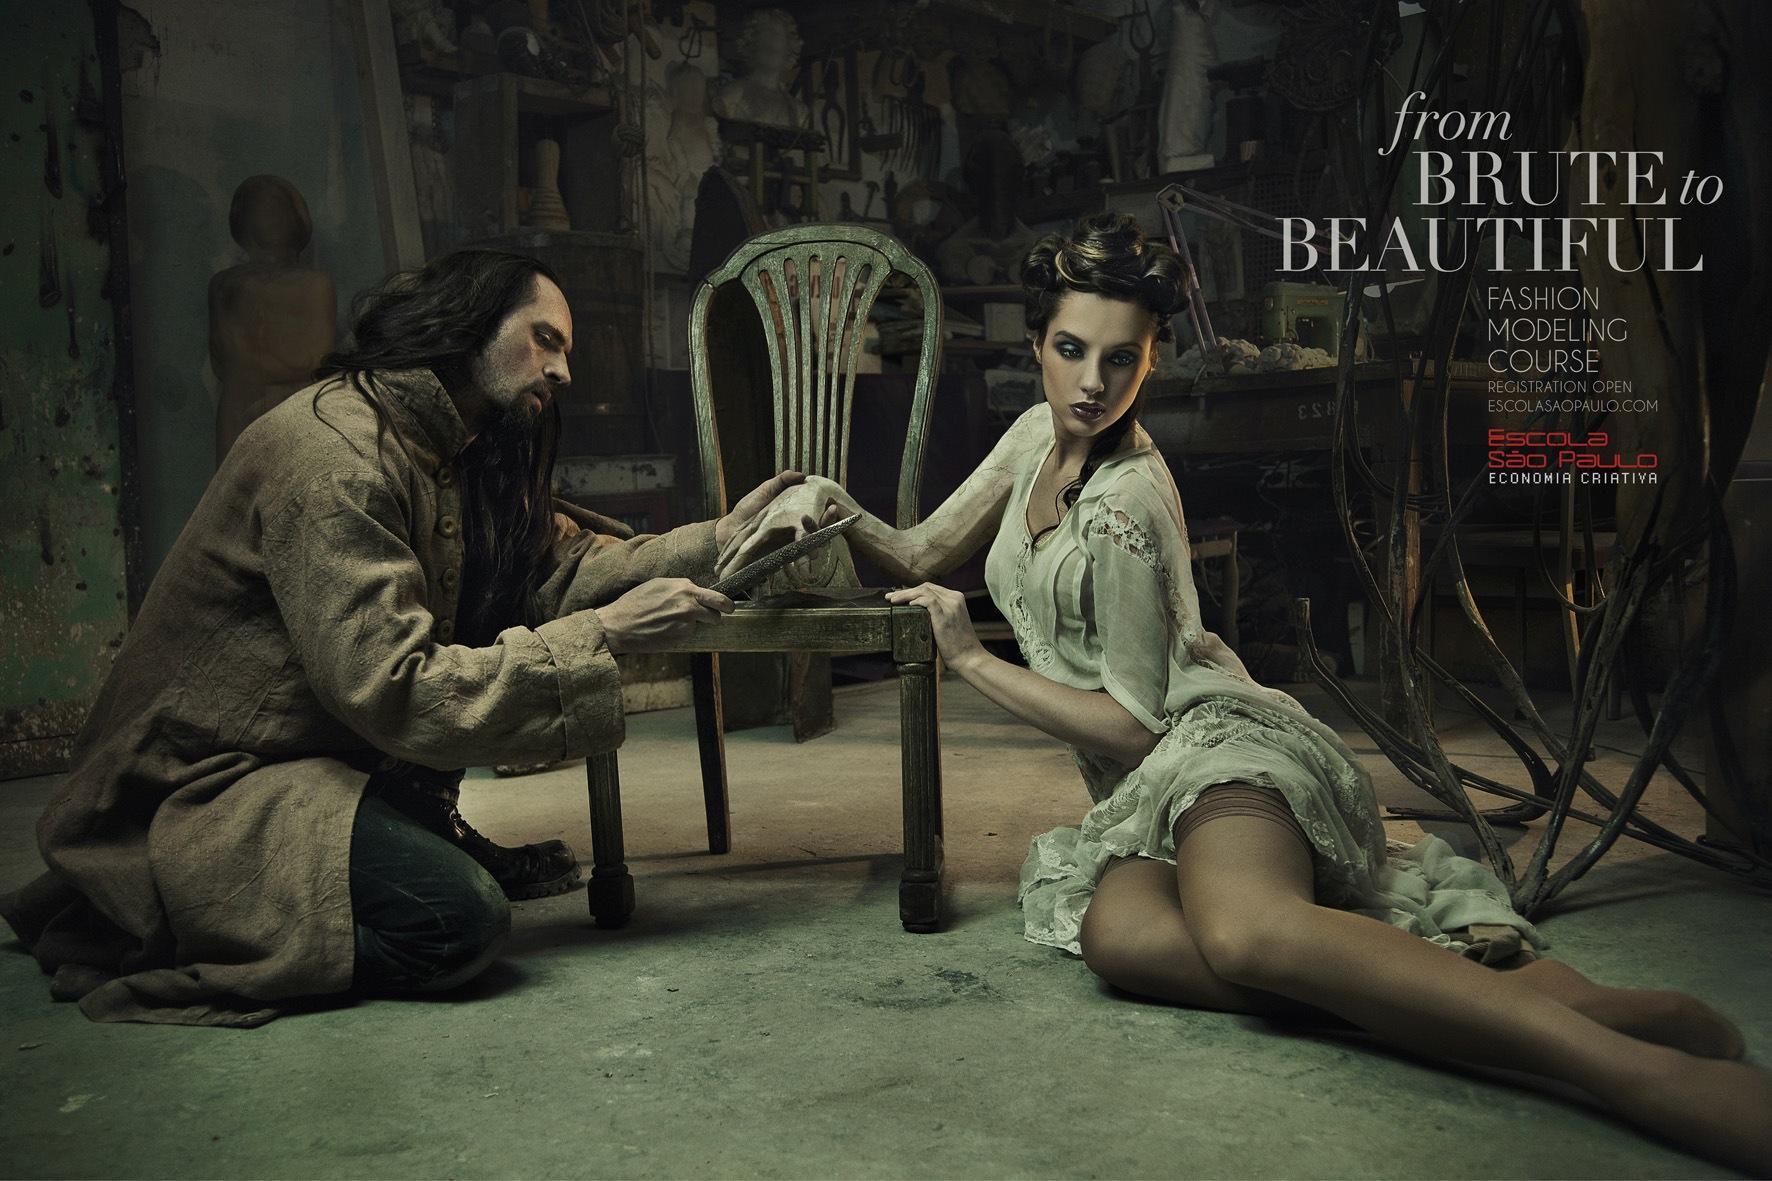 Escola Sao Paulo Print Ad -  From brute to beautiful, 2